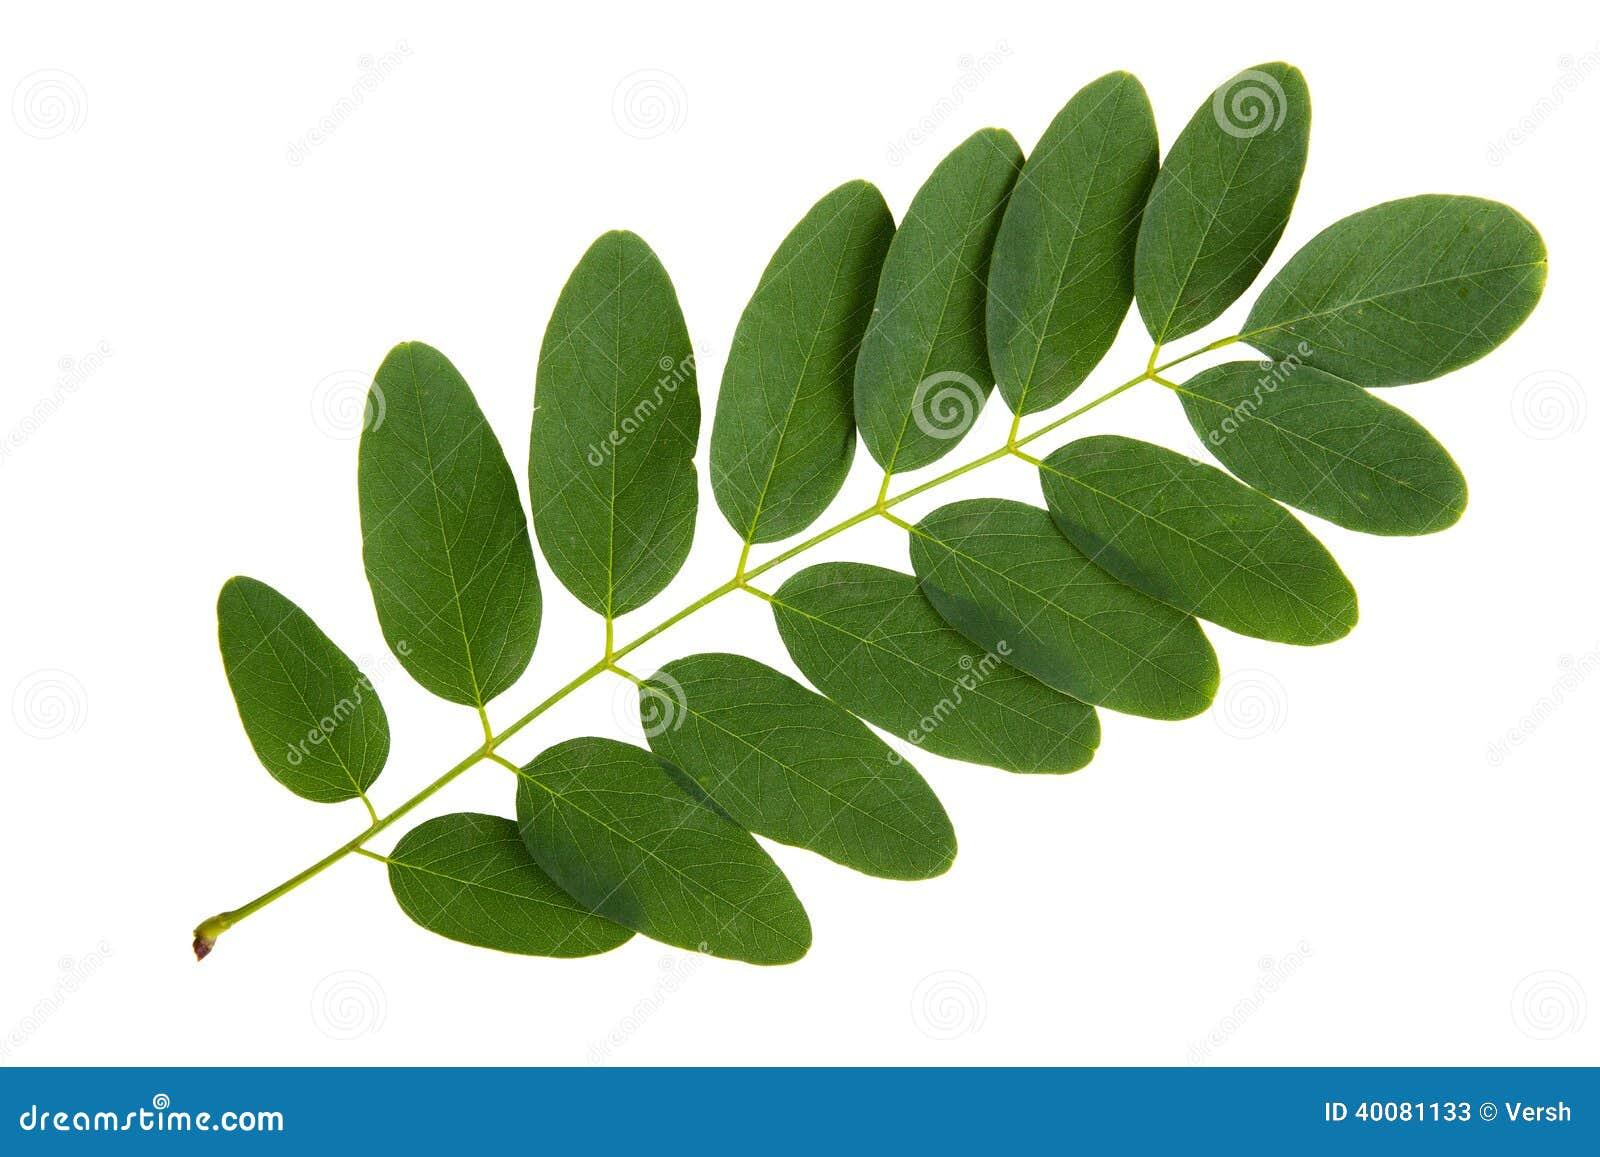 feuille verte d 39 arbre d 39 acacia image stock image du. Black Bedroom Furniture Sets. Home Design Ideas